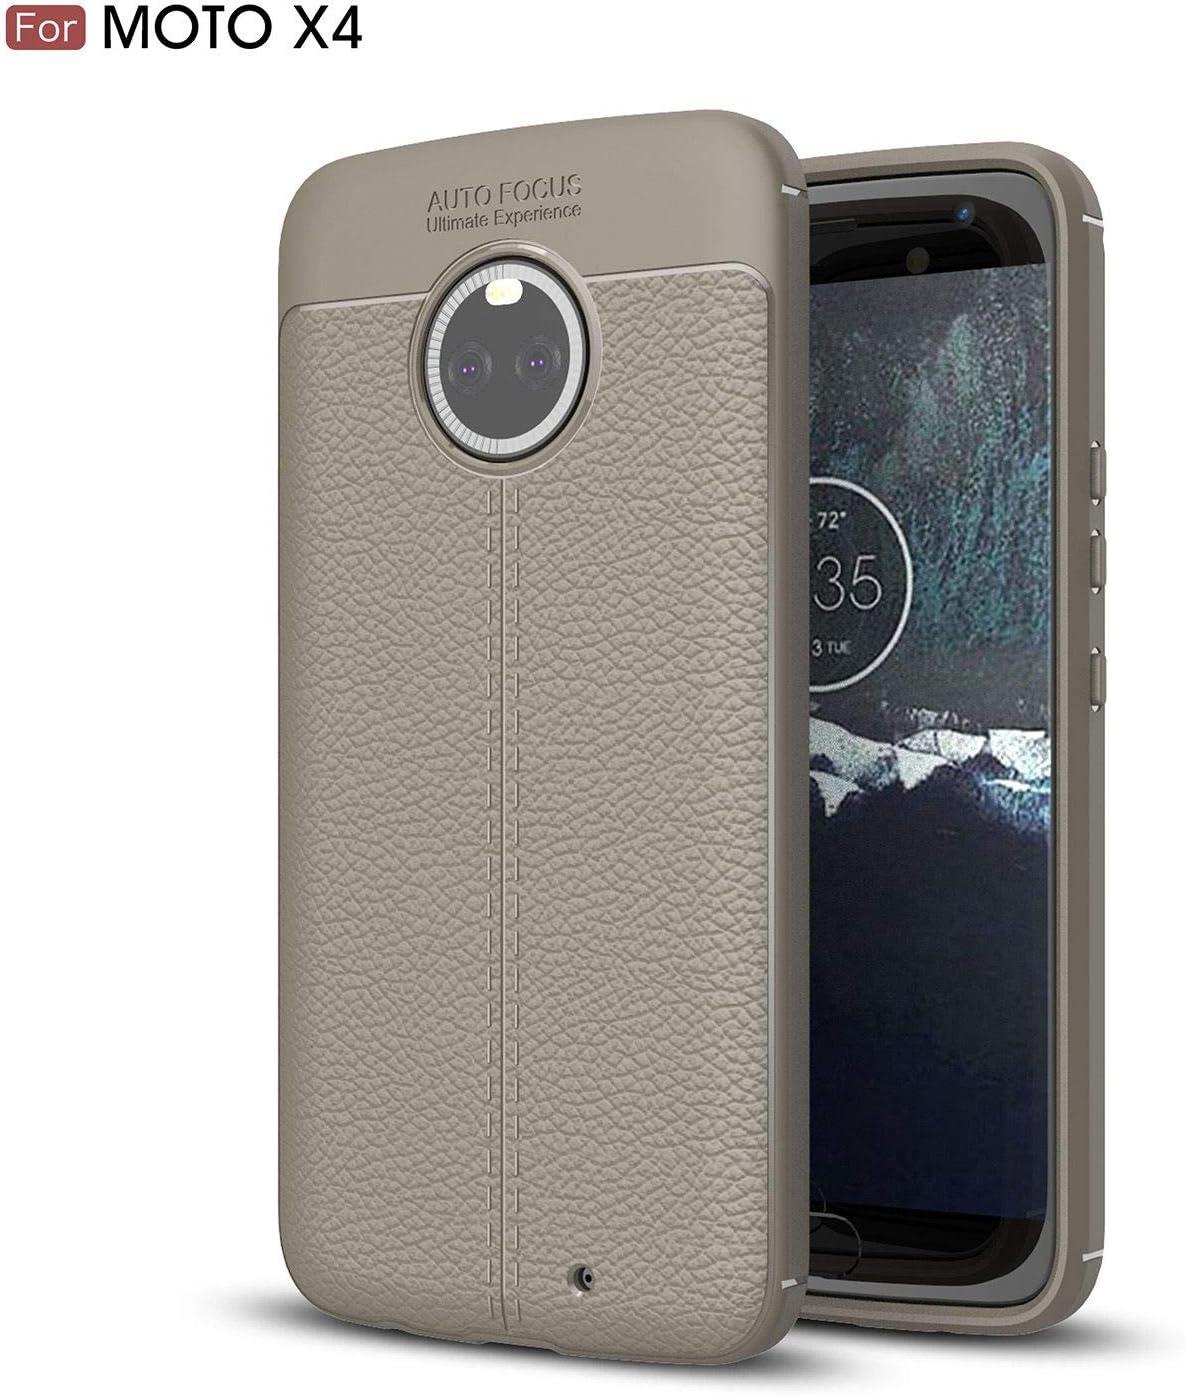 Ycloud Resilient TPU Funda para Motorola Moto X4 Delgado Silicona Case Shock-Absorción Litchi Textura Back Cover Gris Carcasa para Motorola Moto X4: Amazon.es: Electrónica